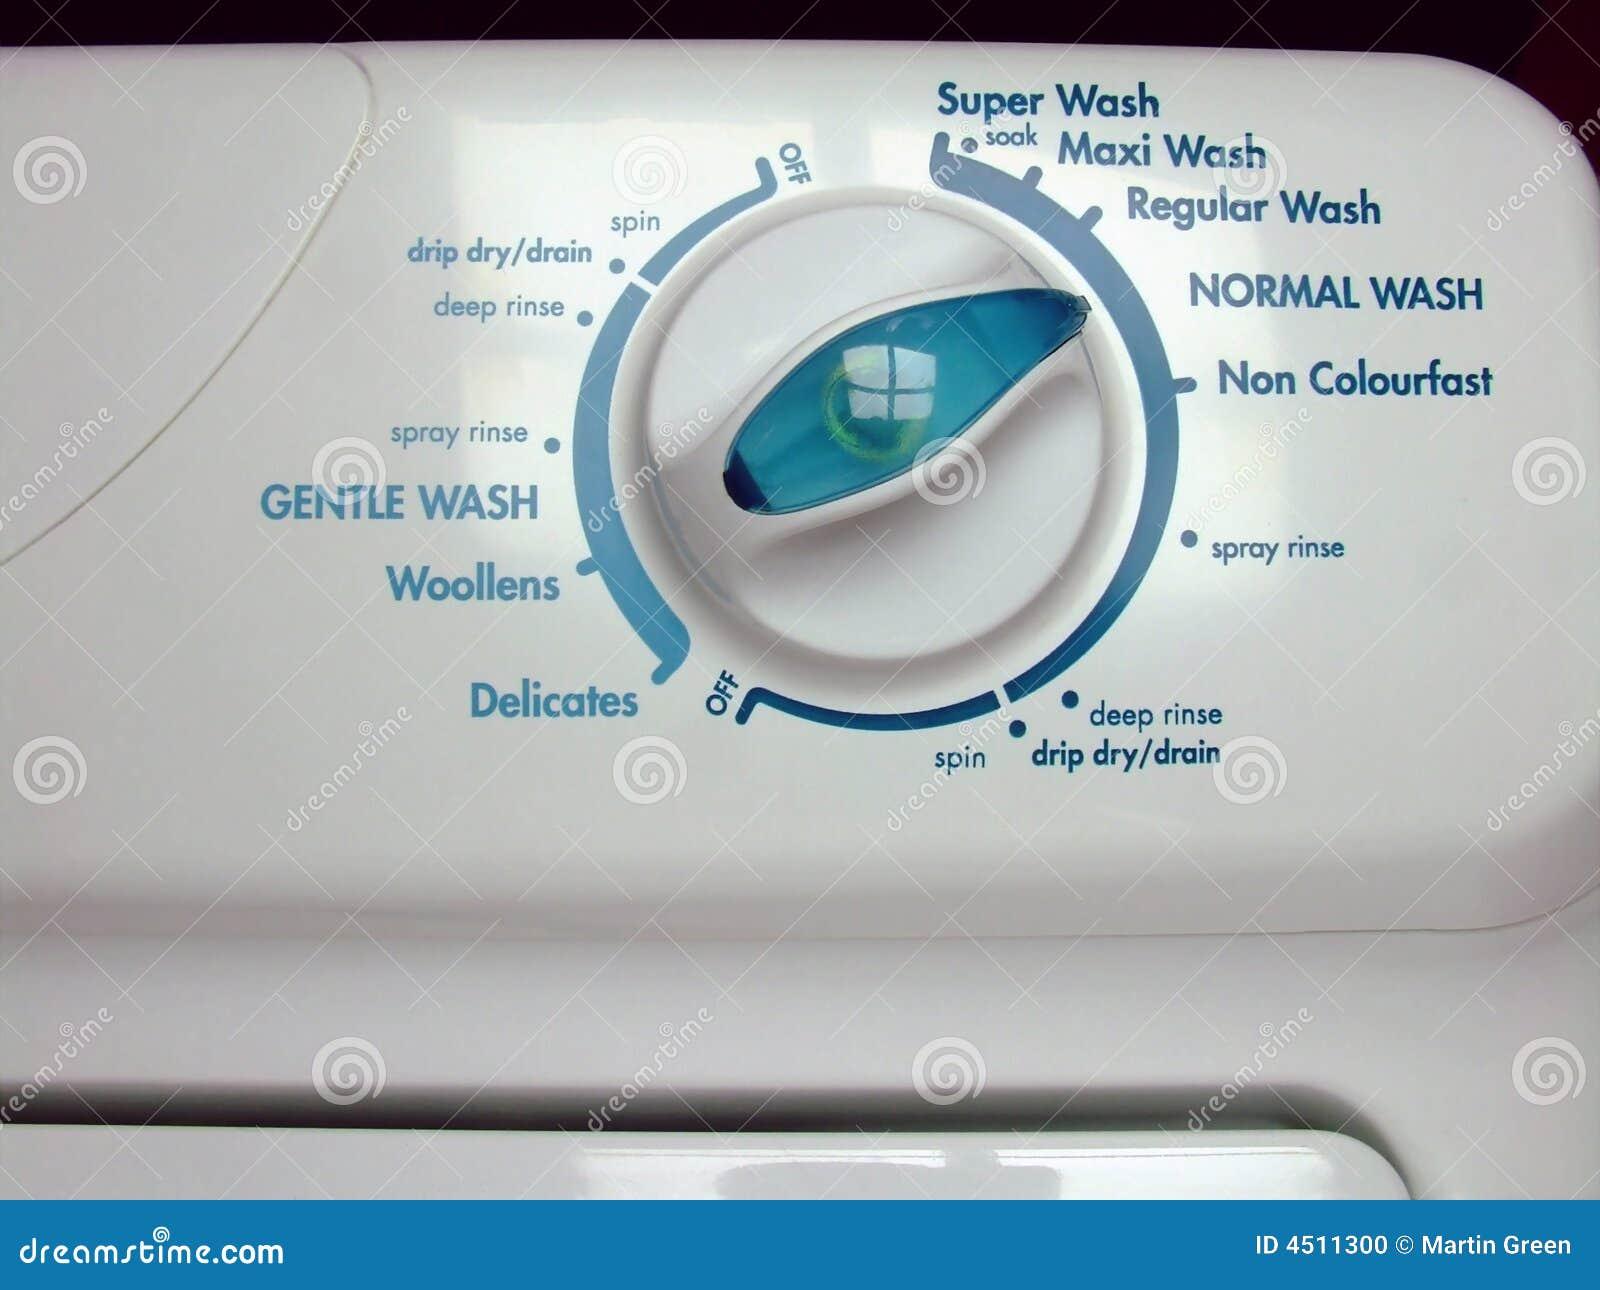 Washing Machine Controls : Washing machine controls stock photo image